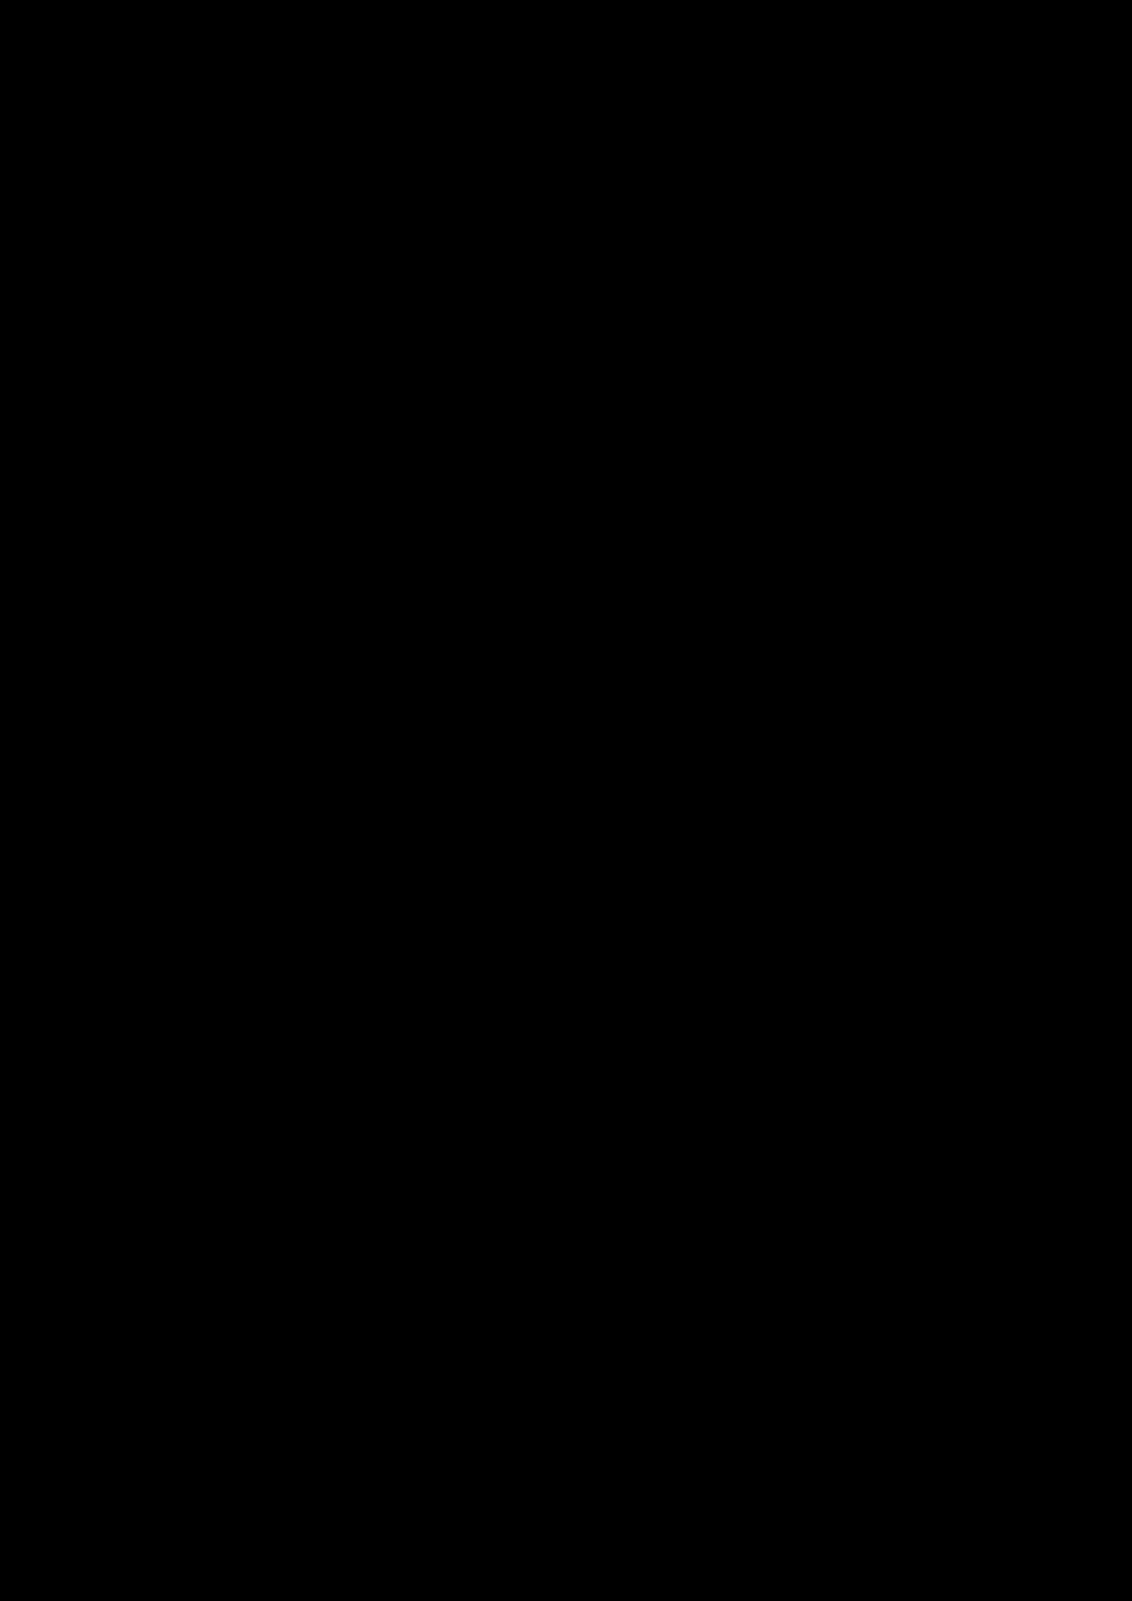 Belyiy sokol slide, Image 99